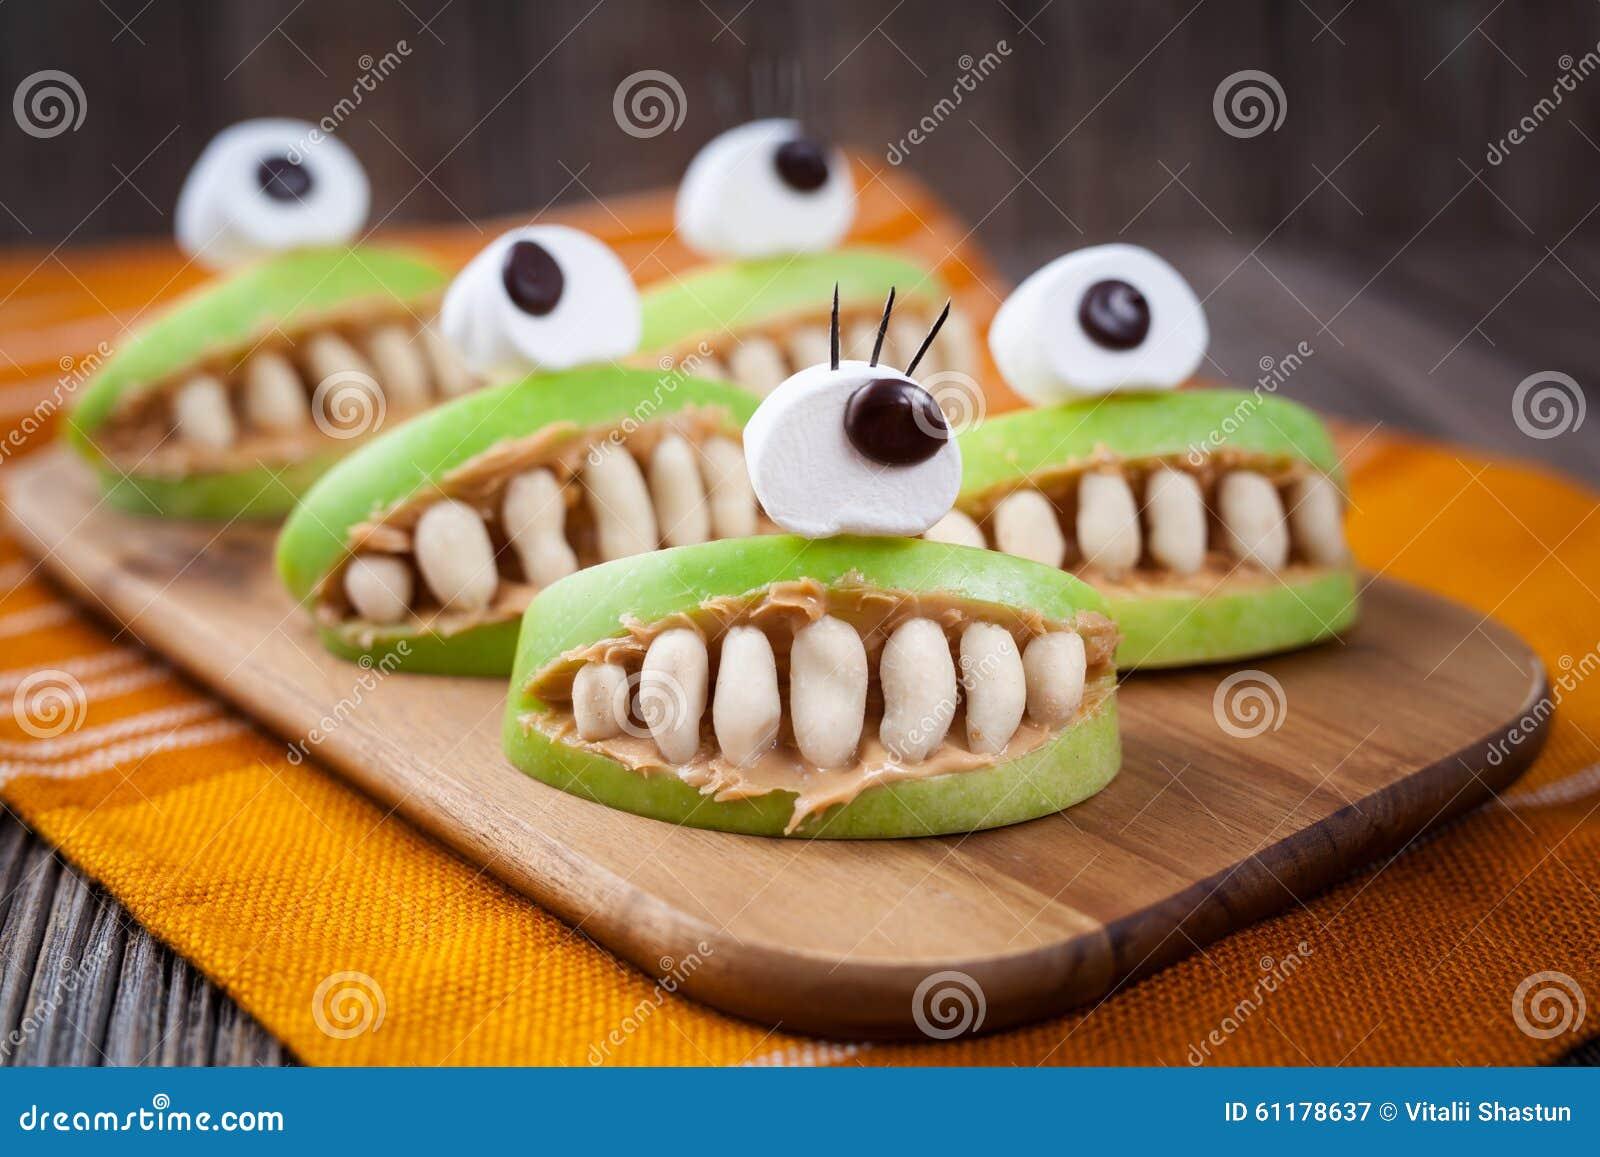 Spooky Halloween Edible Apple Monsters Healthy Stock Image - Image ...